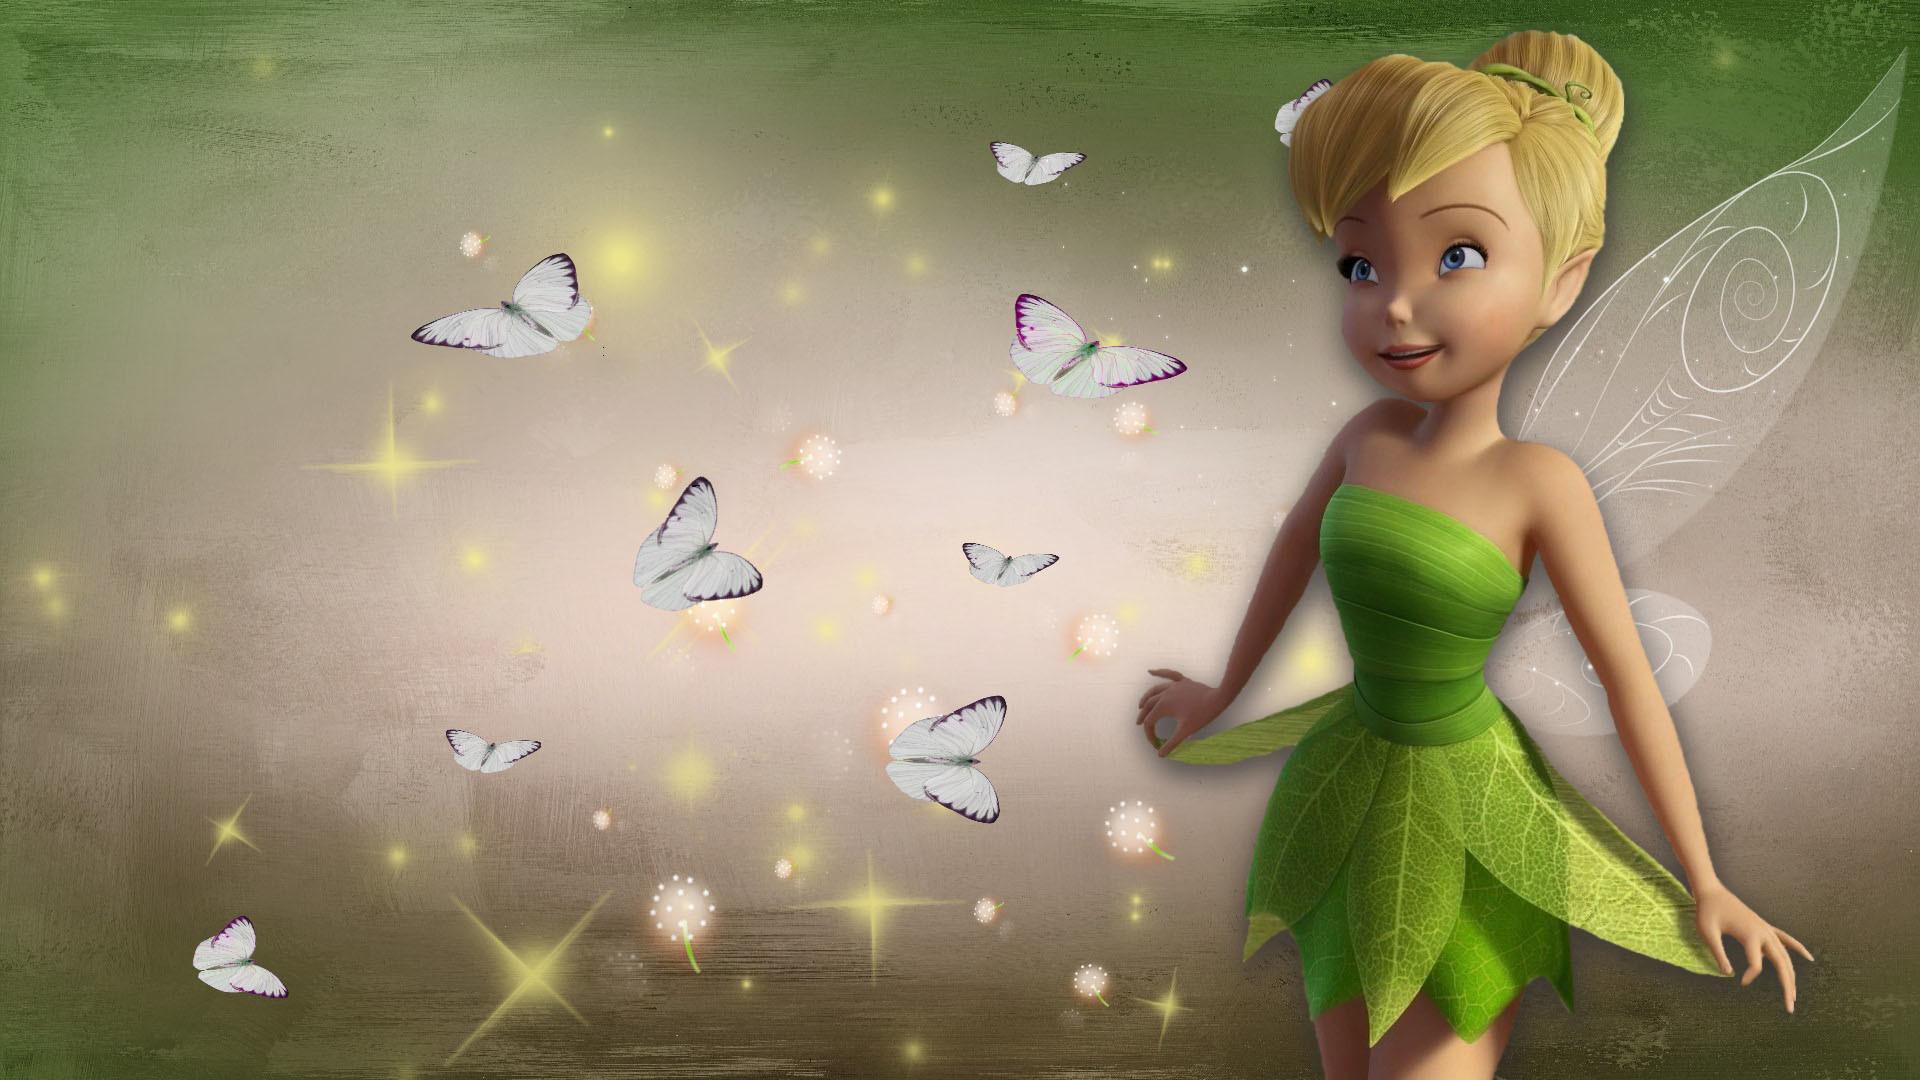 Res: 1920x1080, HD Tinkerbell Disney Fairy Wallpaper 1920×1080 Full Size .